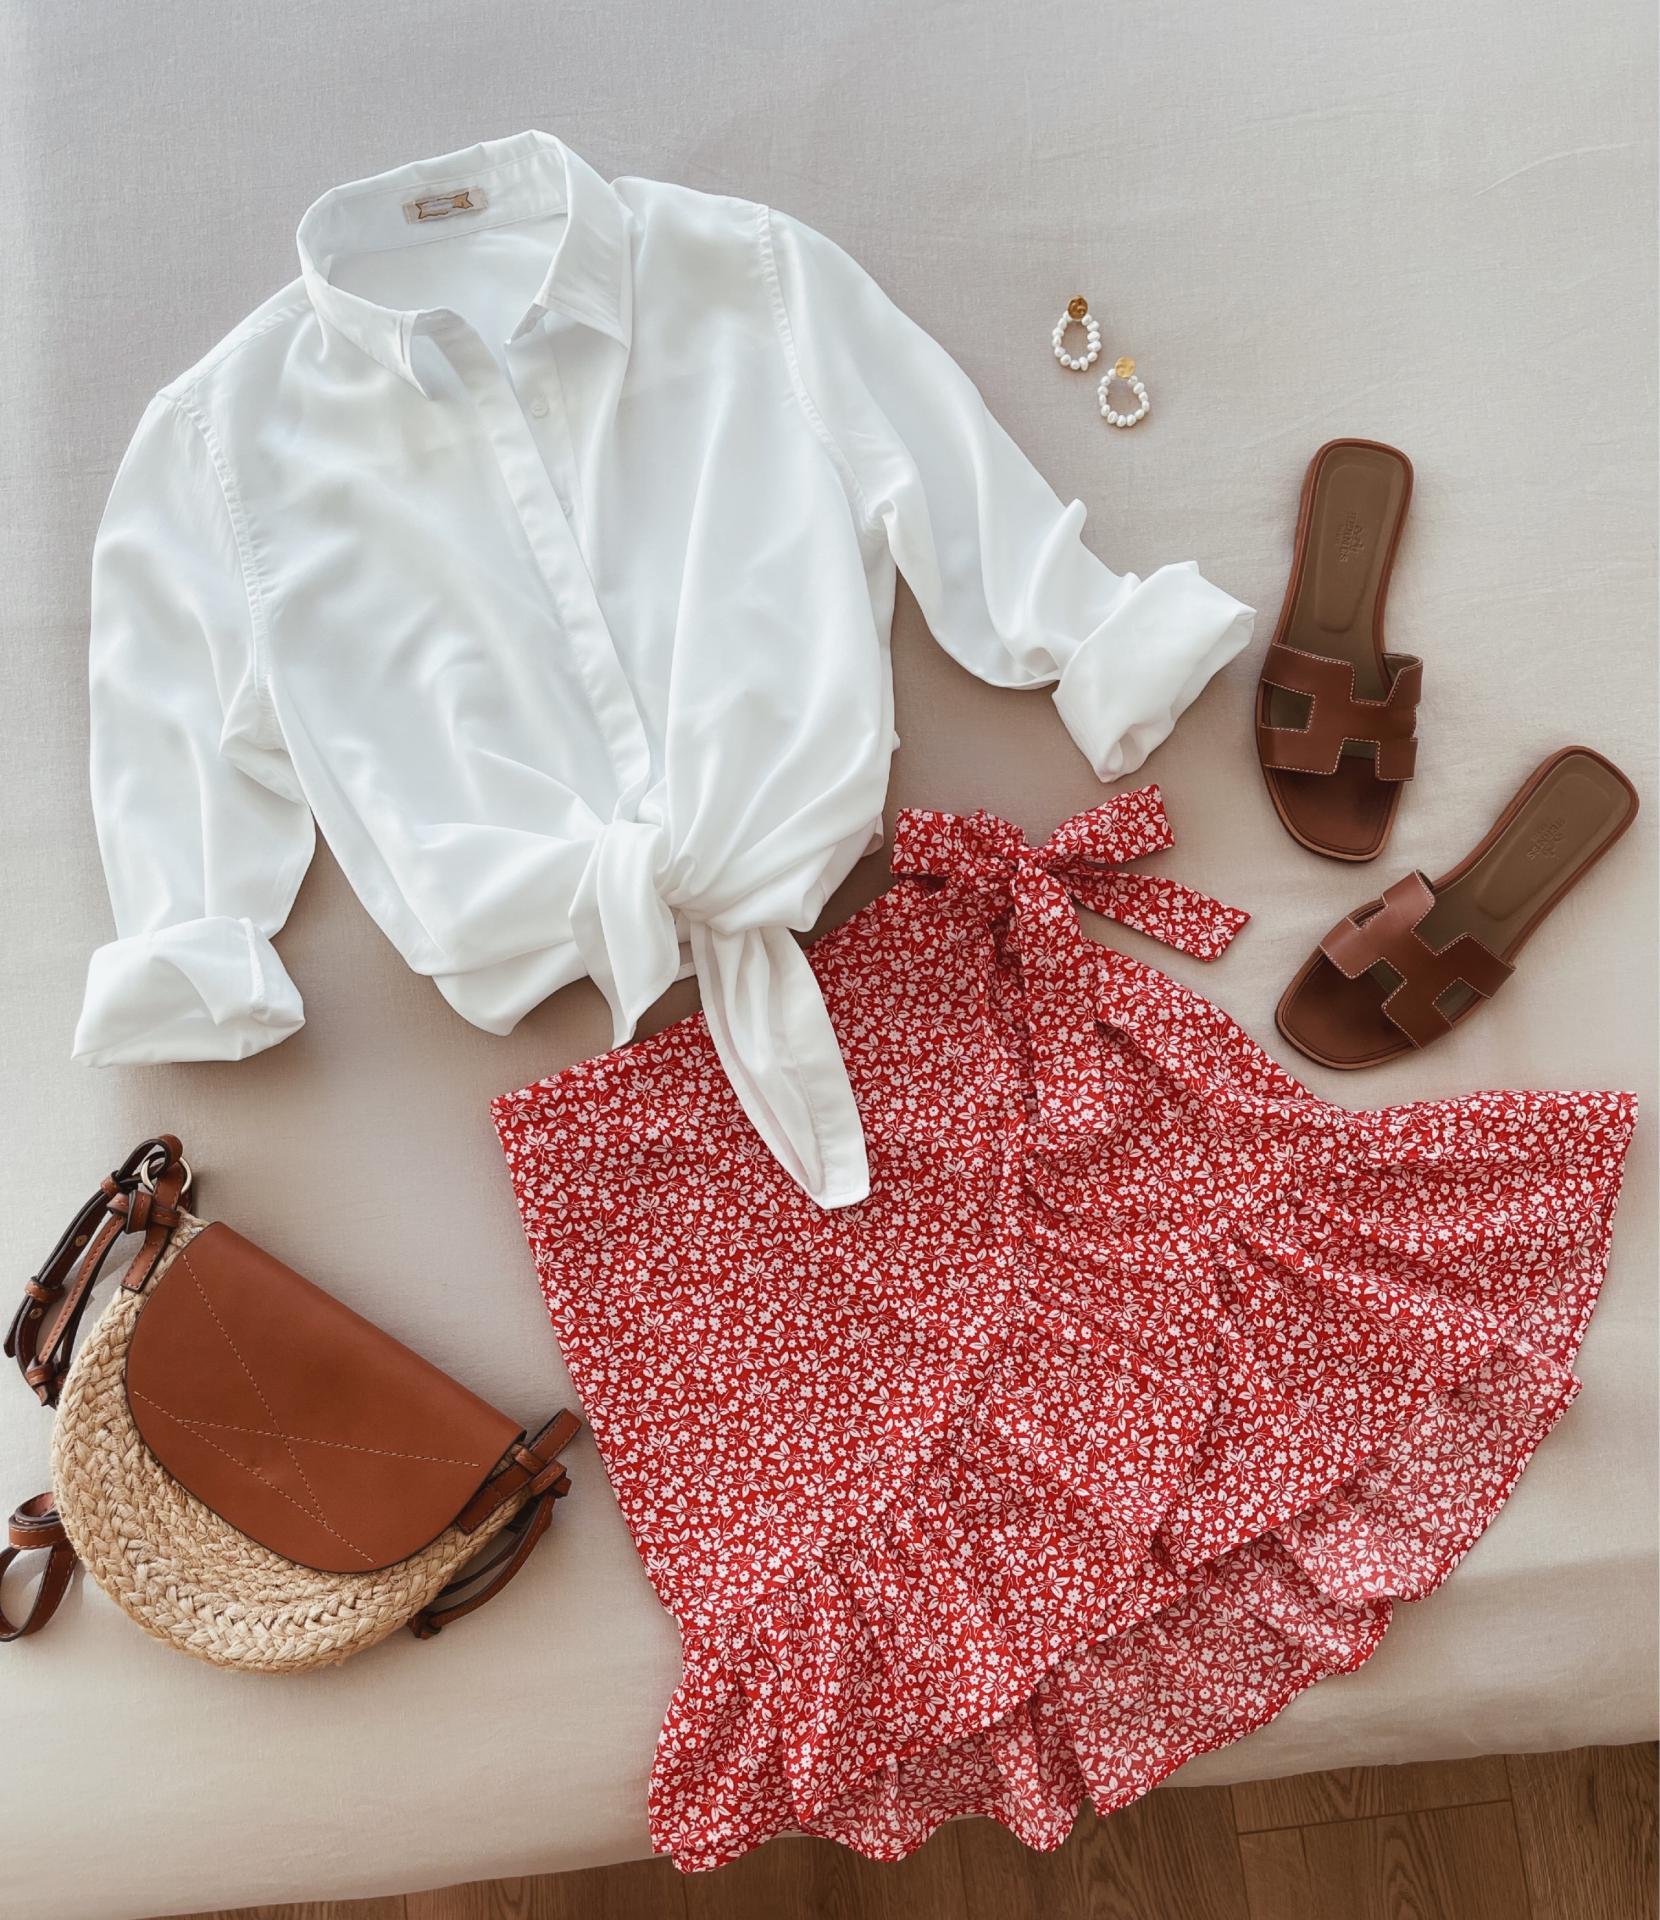 Falda Red Skirt (Ref. 5671)